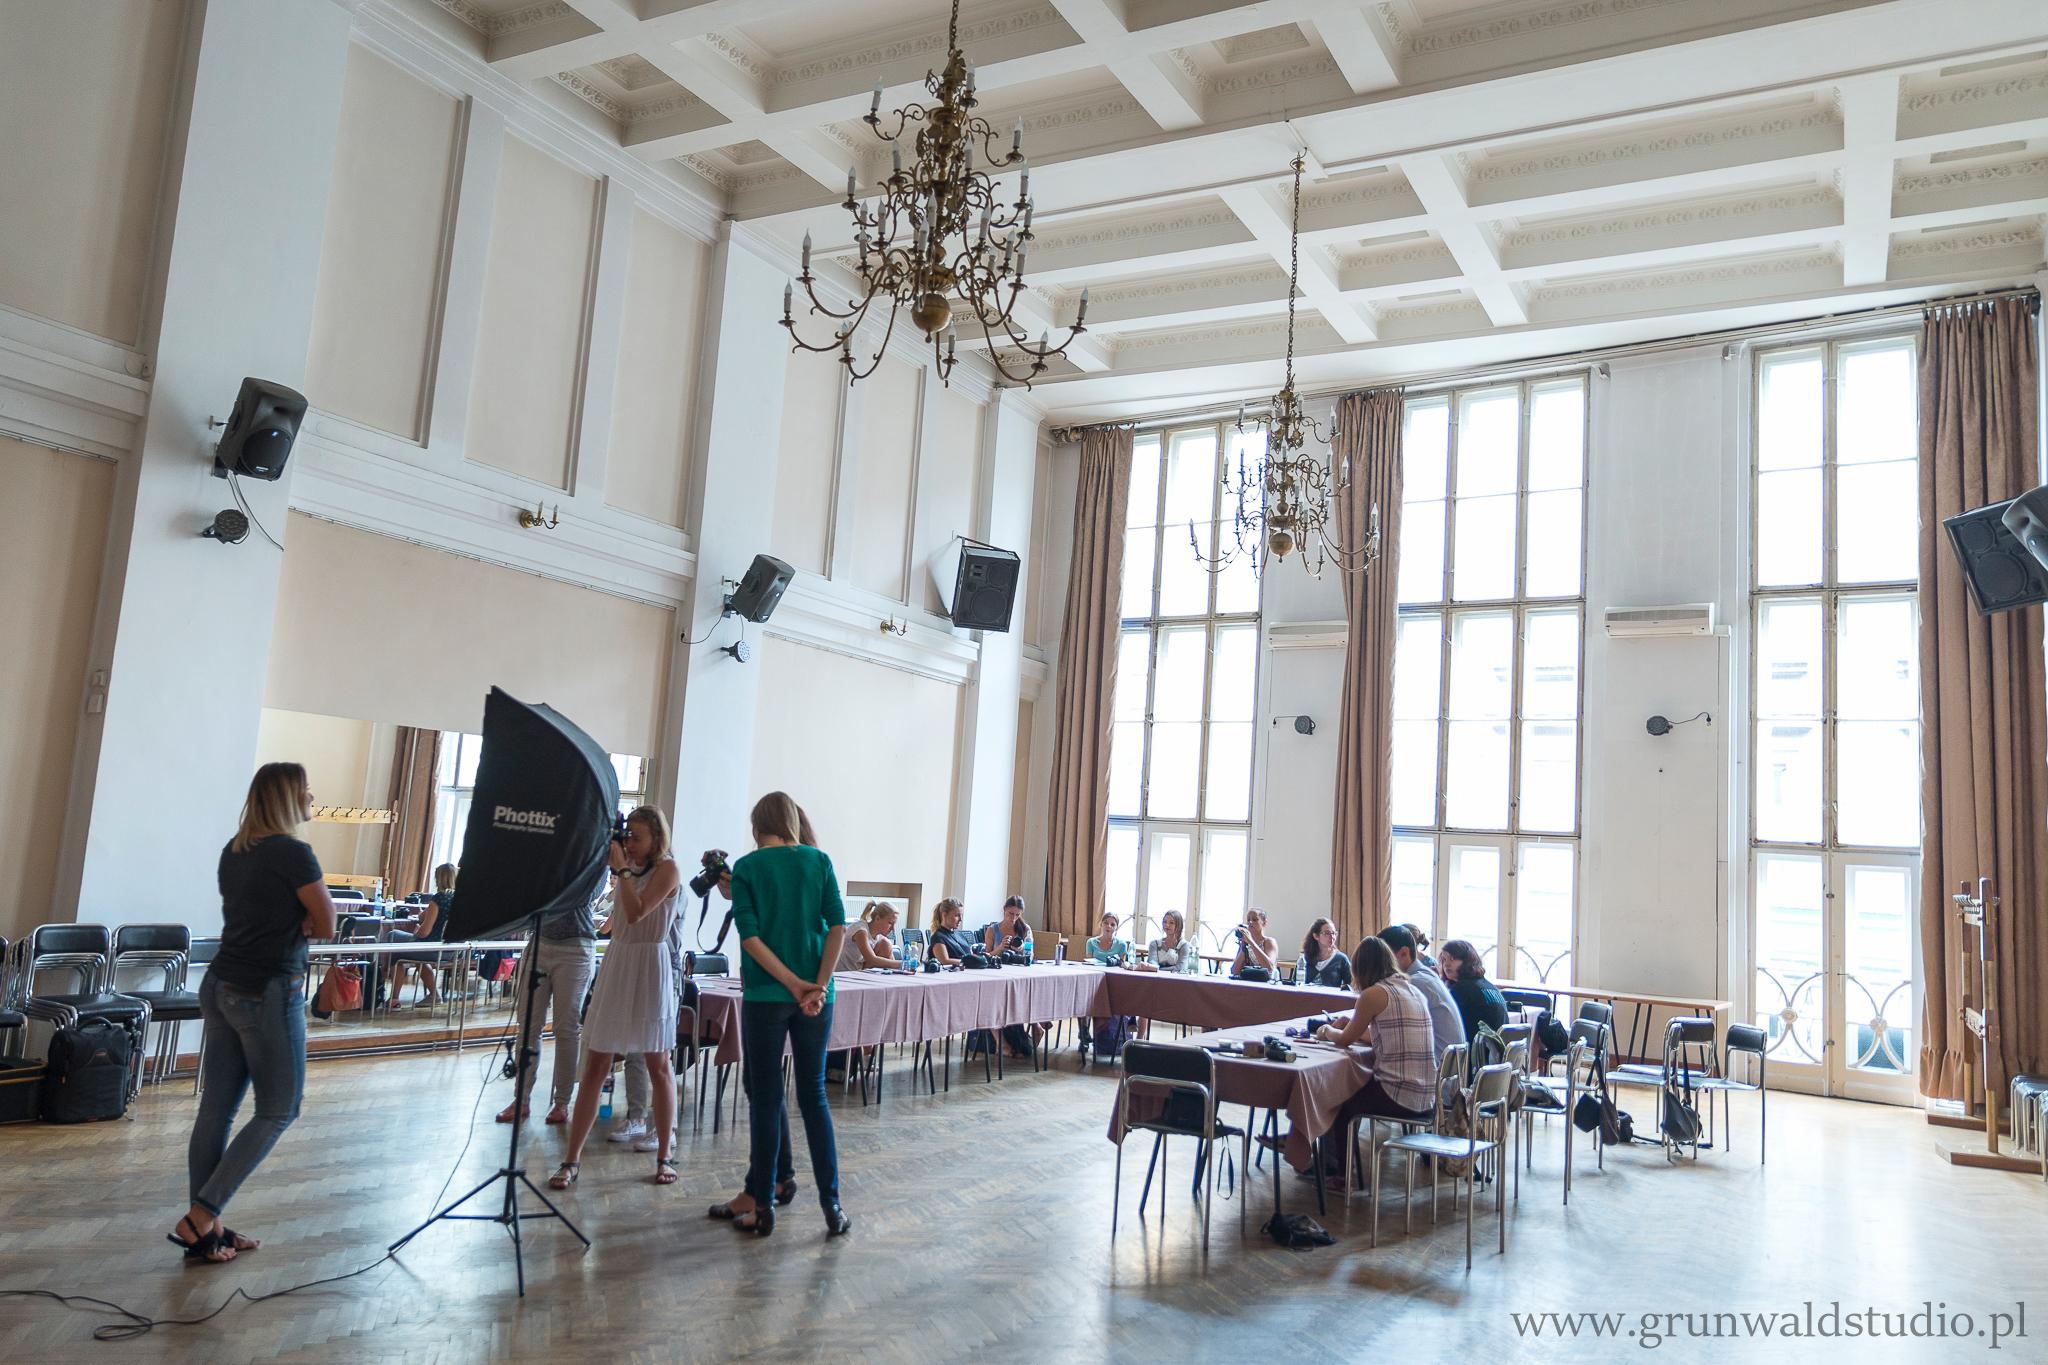 grunwald-studio-kursy-fotografii-krakow-3-of-18